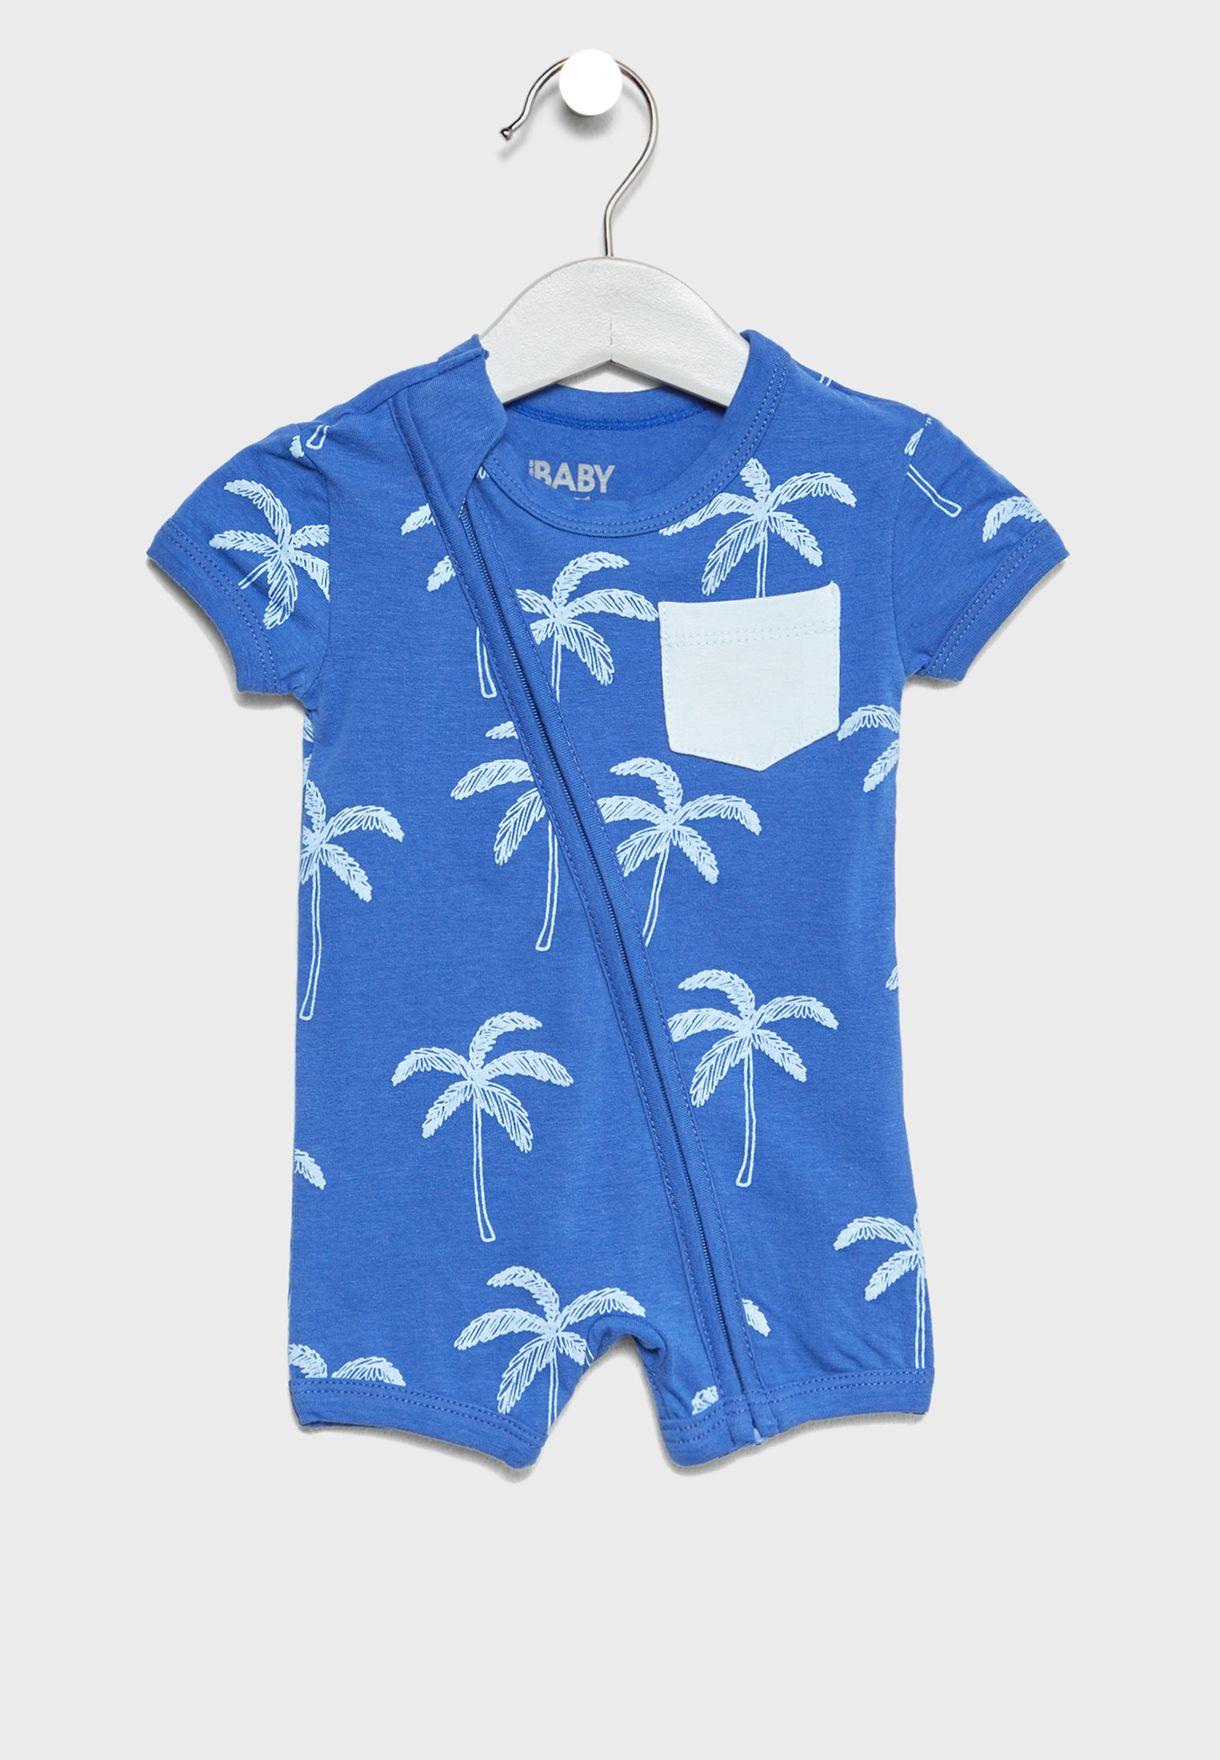 75b3338bb251 Shop Cotton On prints Little Zip Through Romper 761562-85 for Kids ...